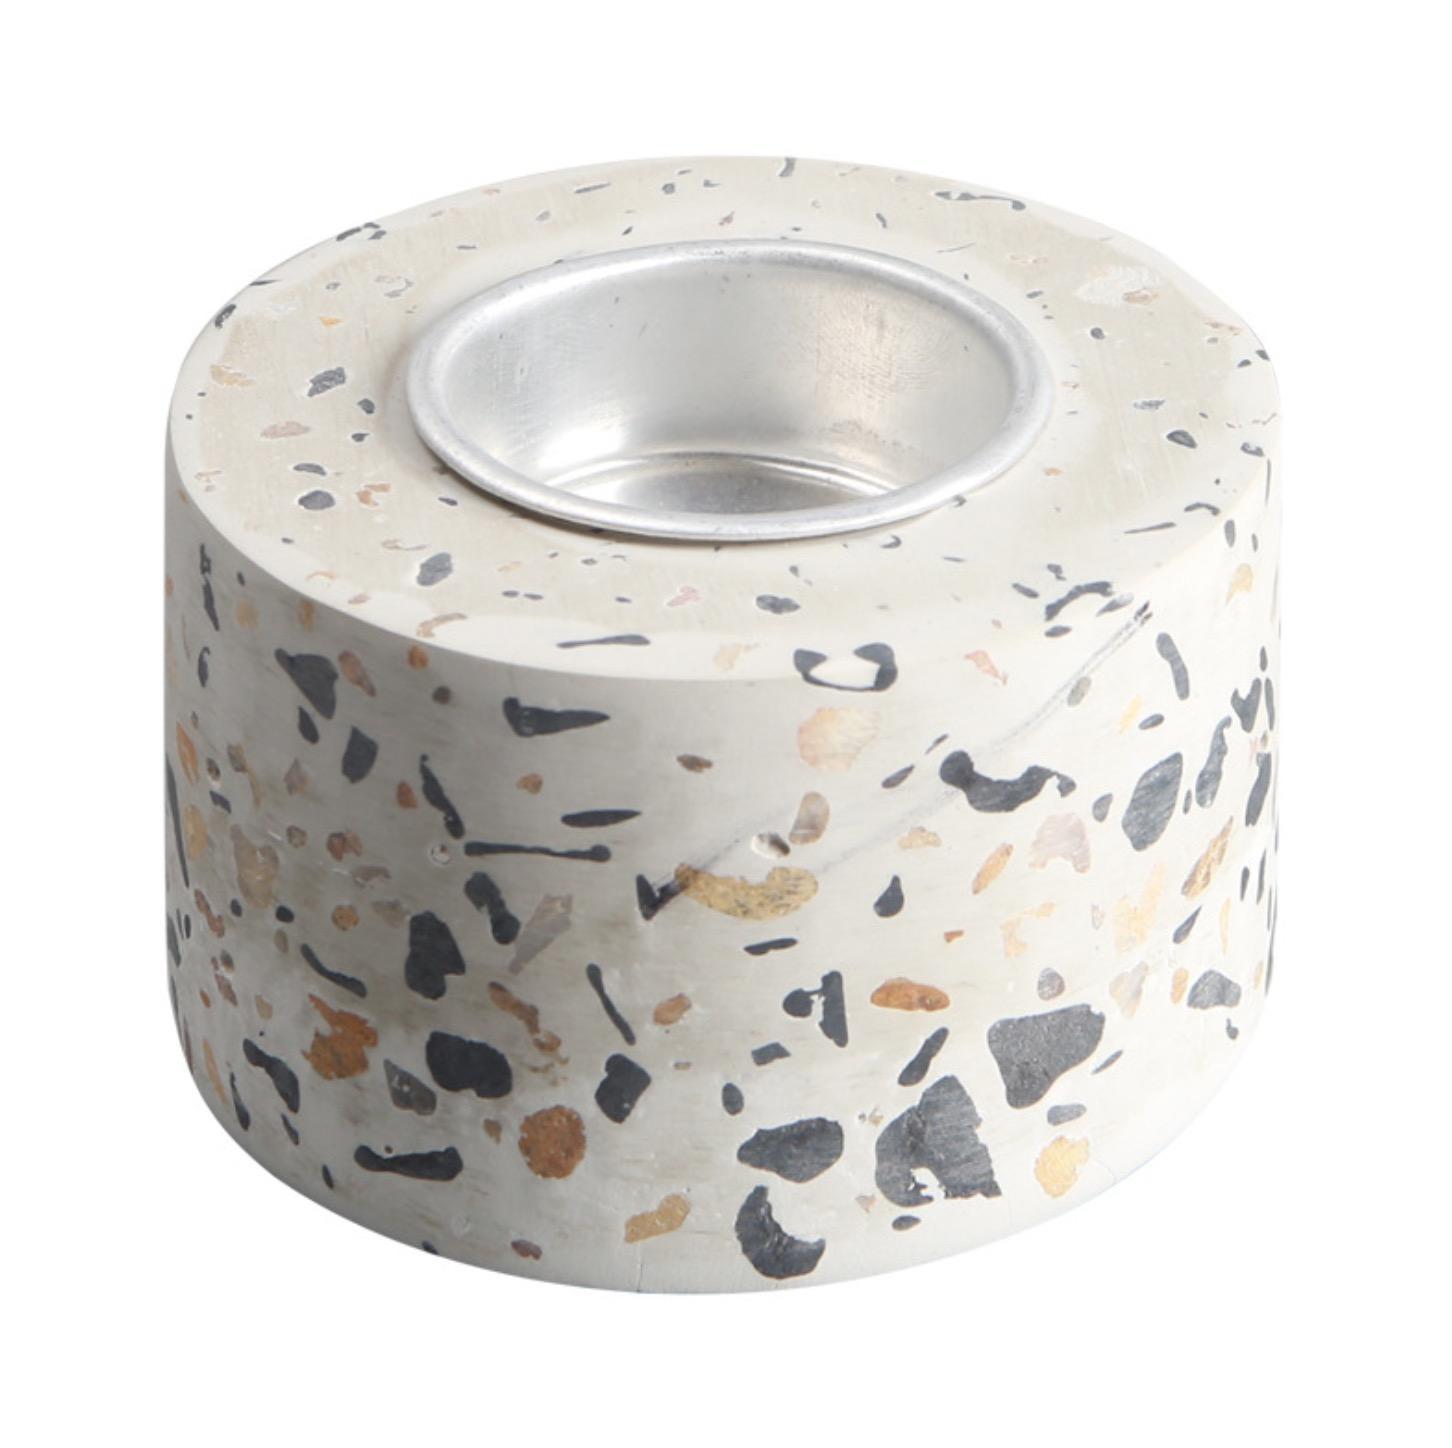 Terrazzo Tea Light Holder Concrete Stoneware Candle Holder FREE SAMPLE 3